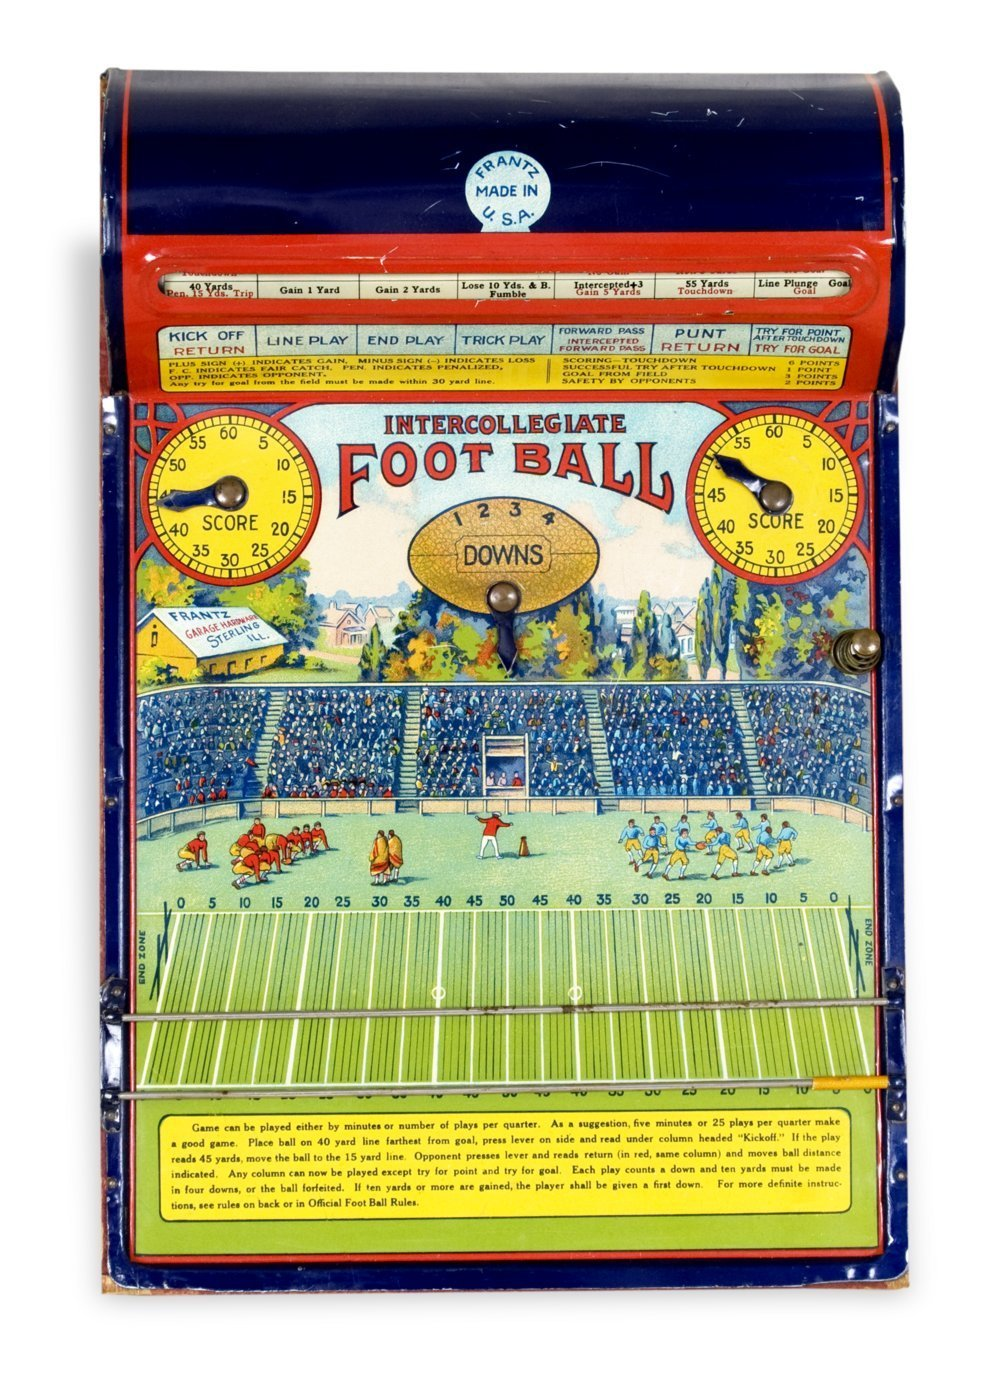 Mechanical football game